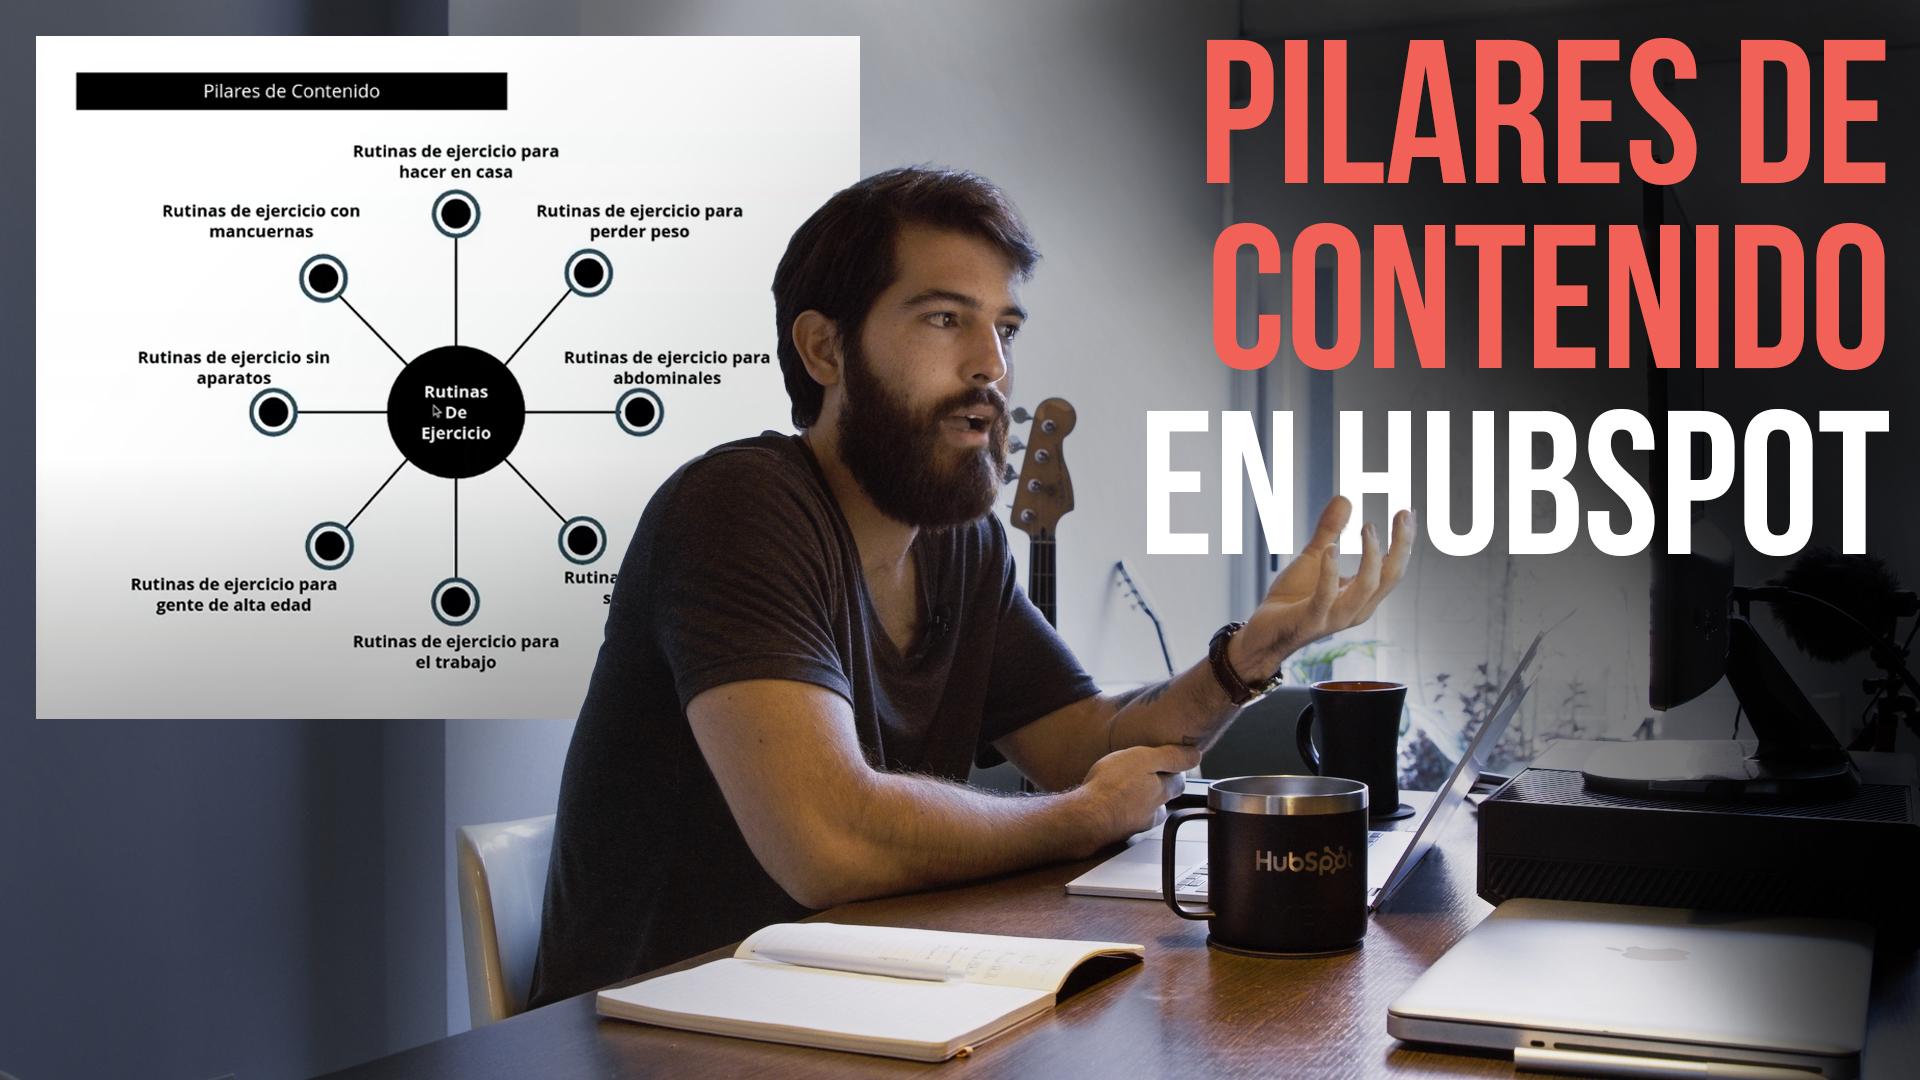 Pilares de Contenido en HubSpot